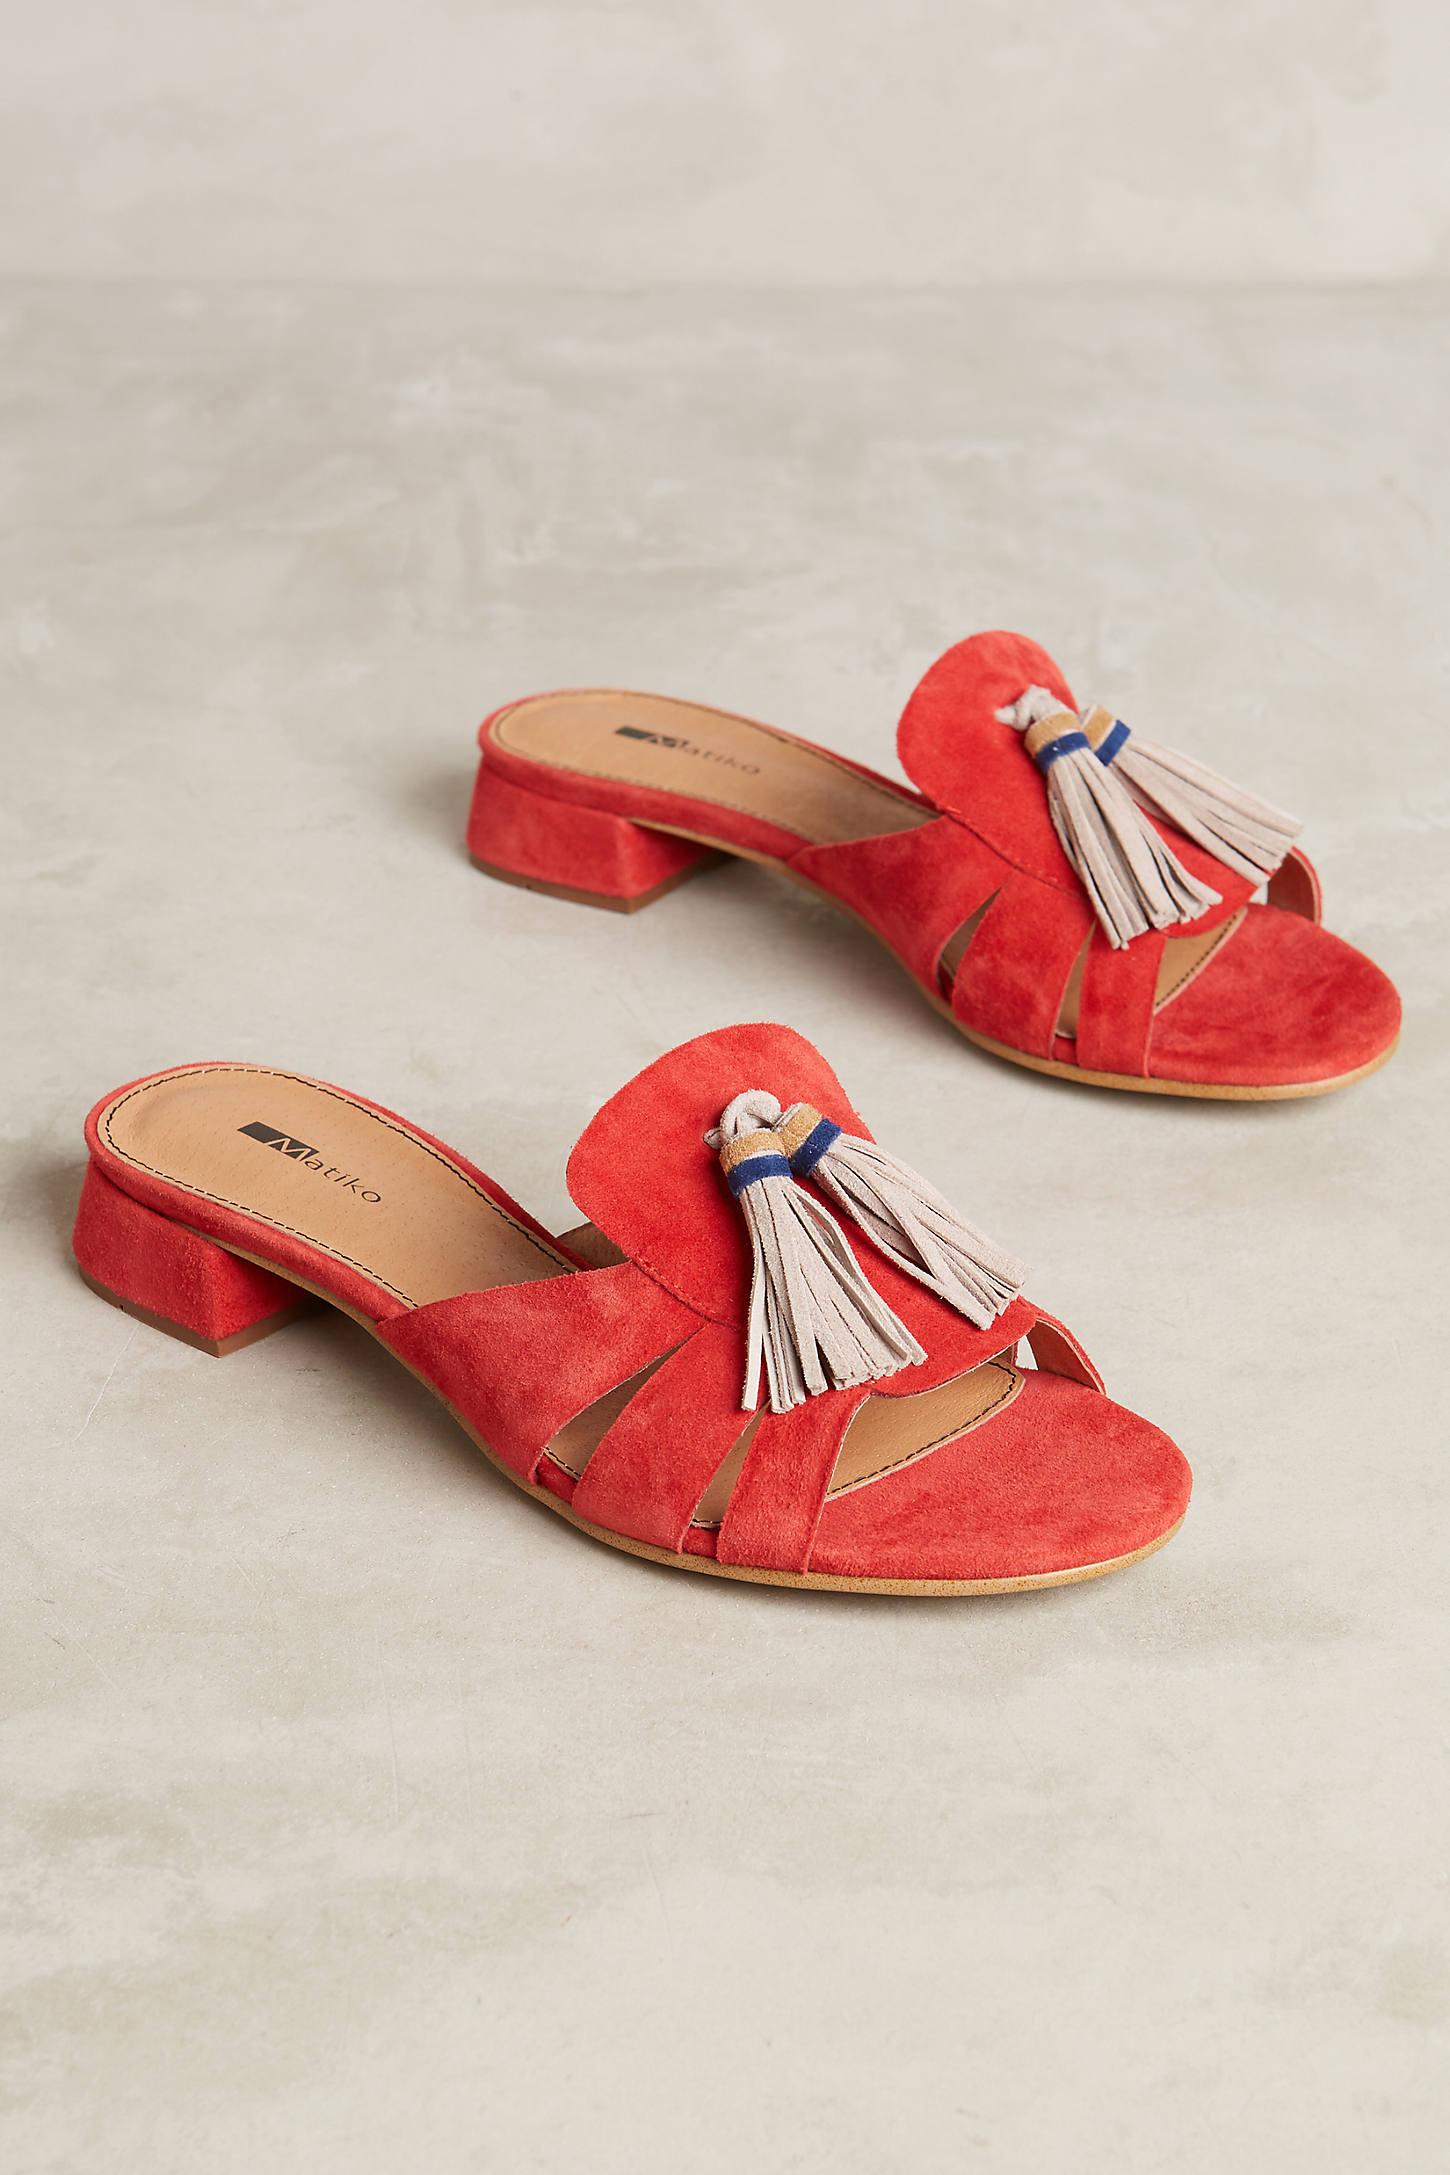 Matiko Susan Slide Sandals